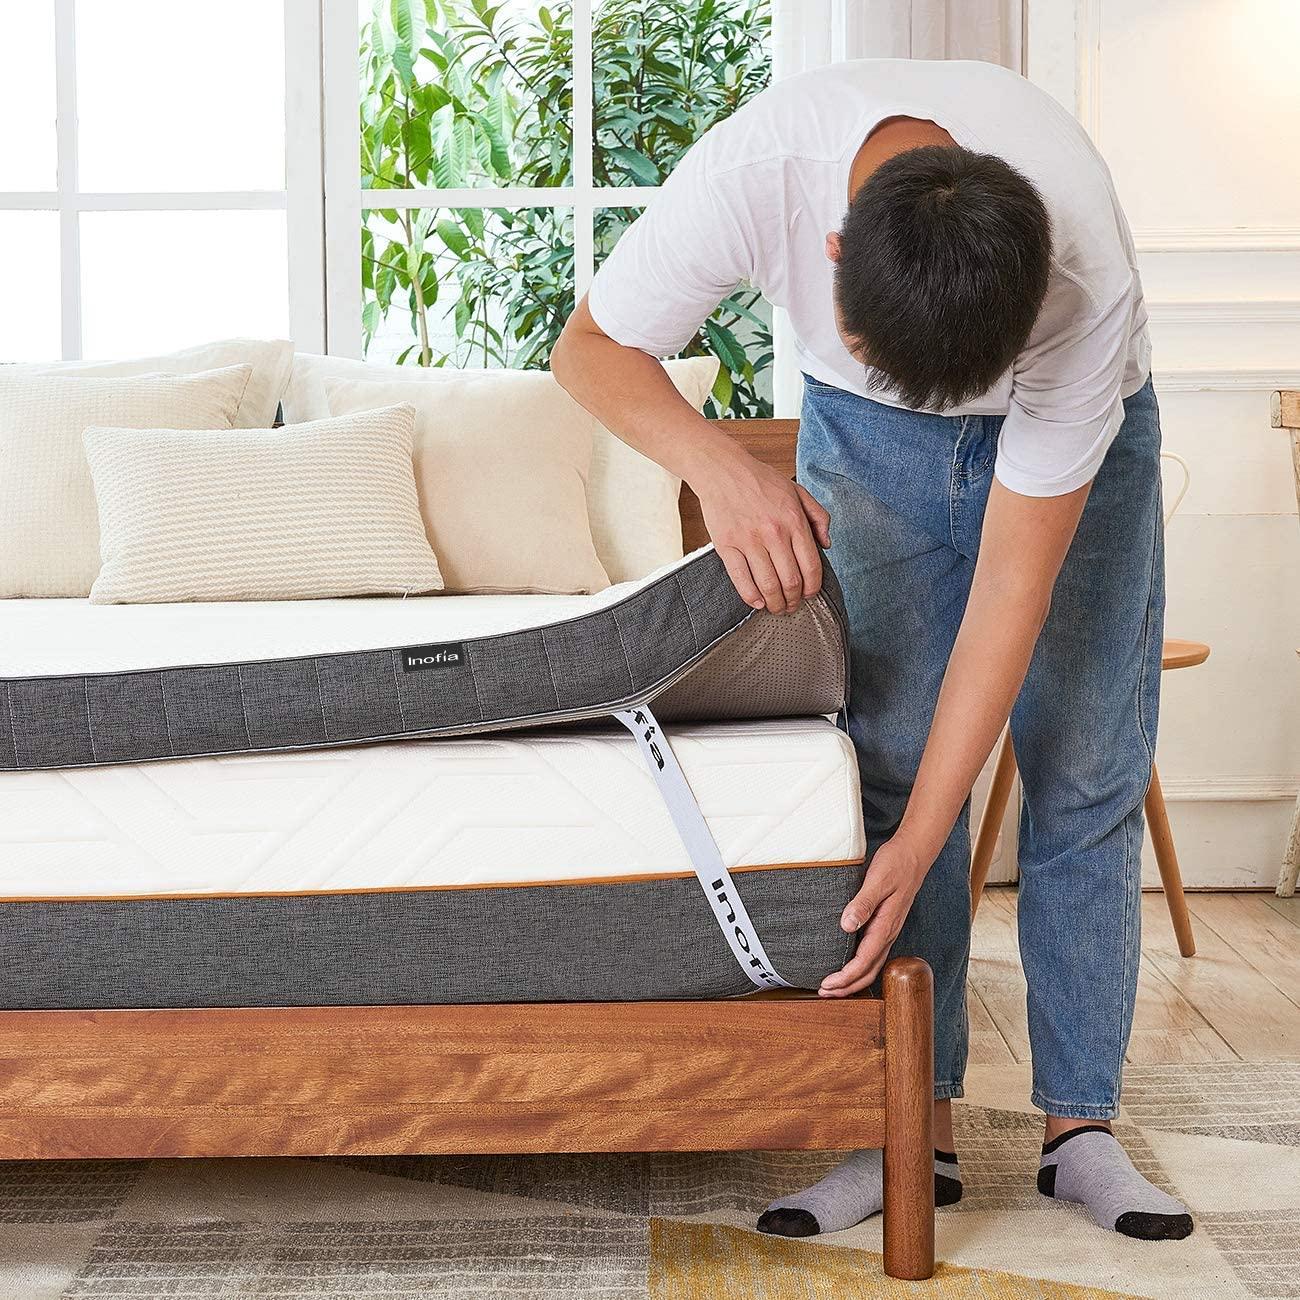 Inofia Gel Memory Foam Mattress Topper Roll In The Carton Amazon Pressure Relieving Mattress Topper